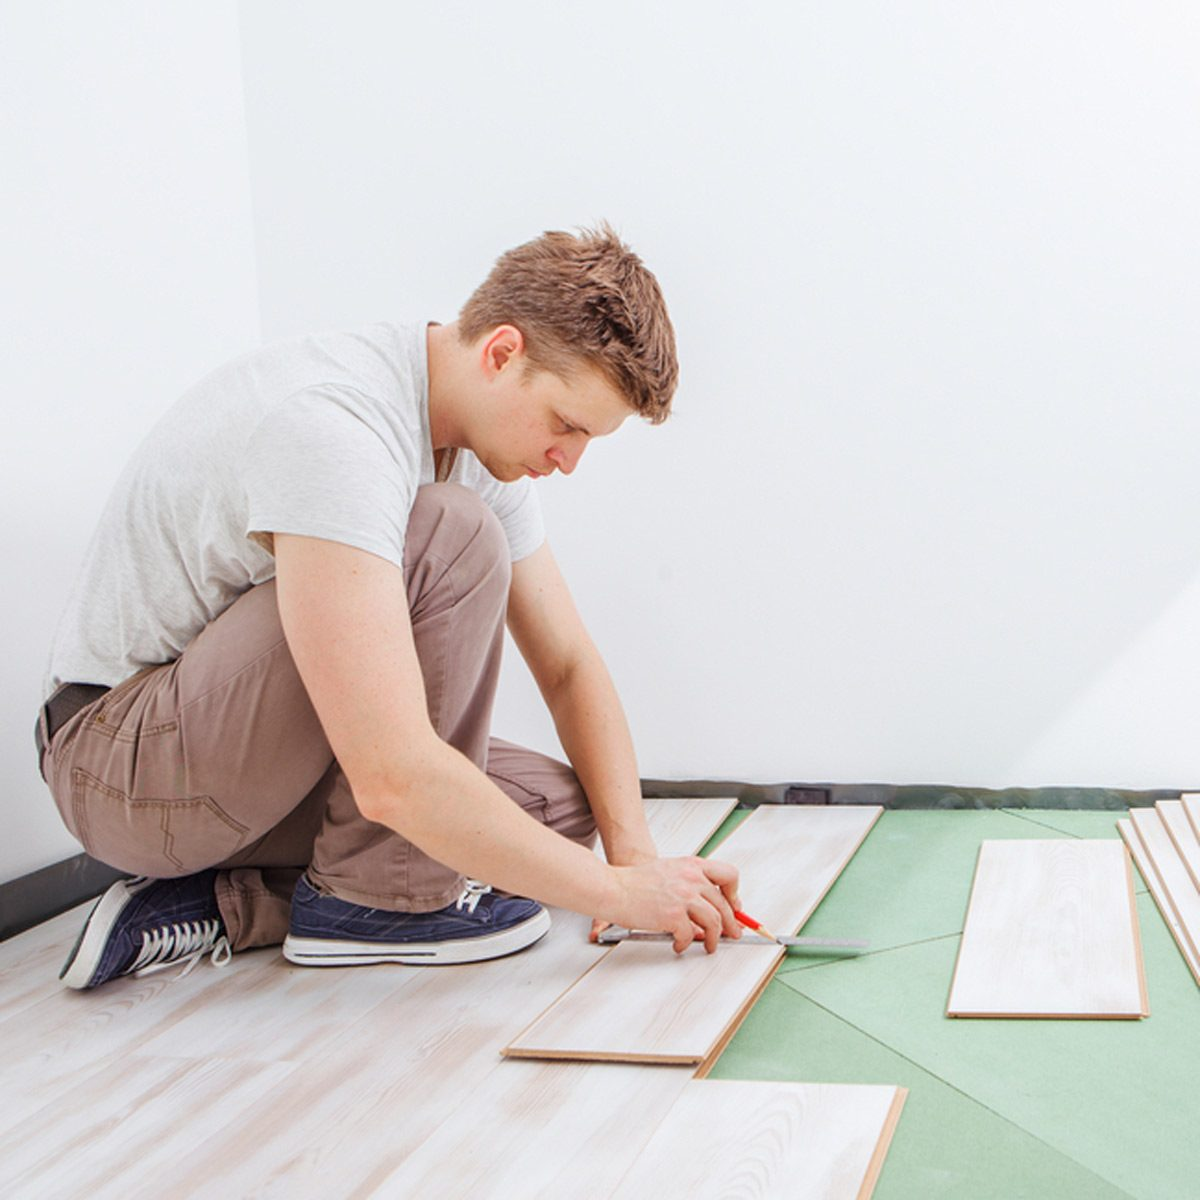 shutterstock_425002525 install laminate hardwood floors